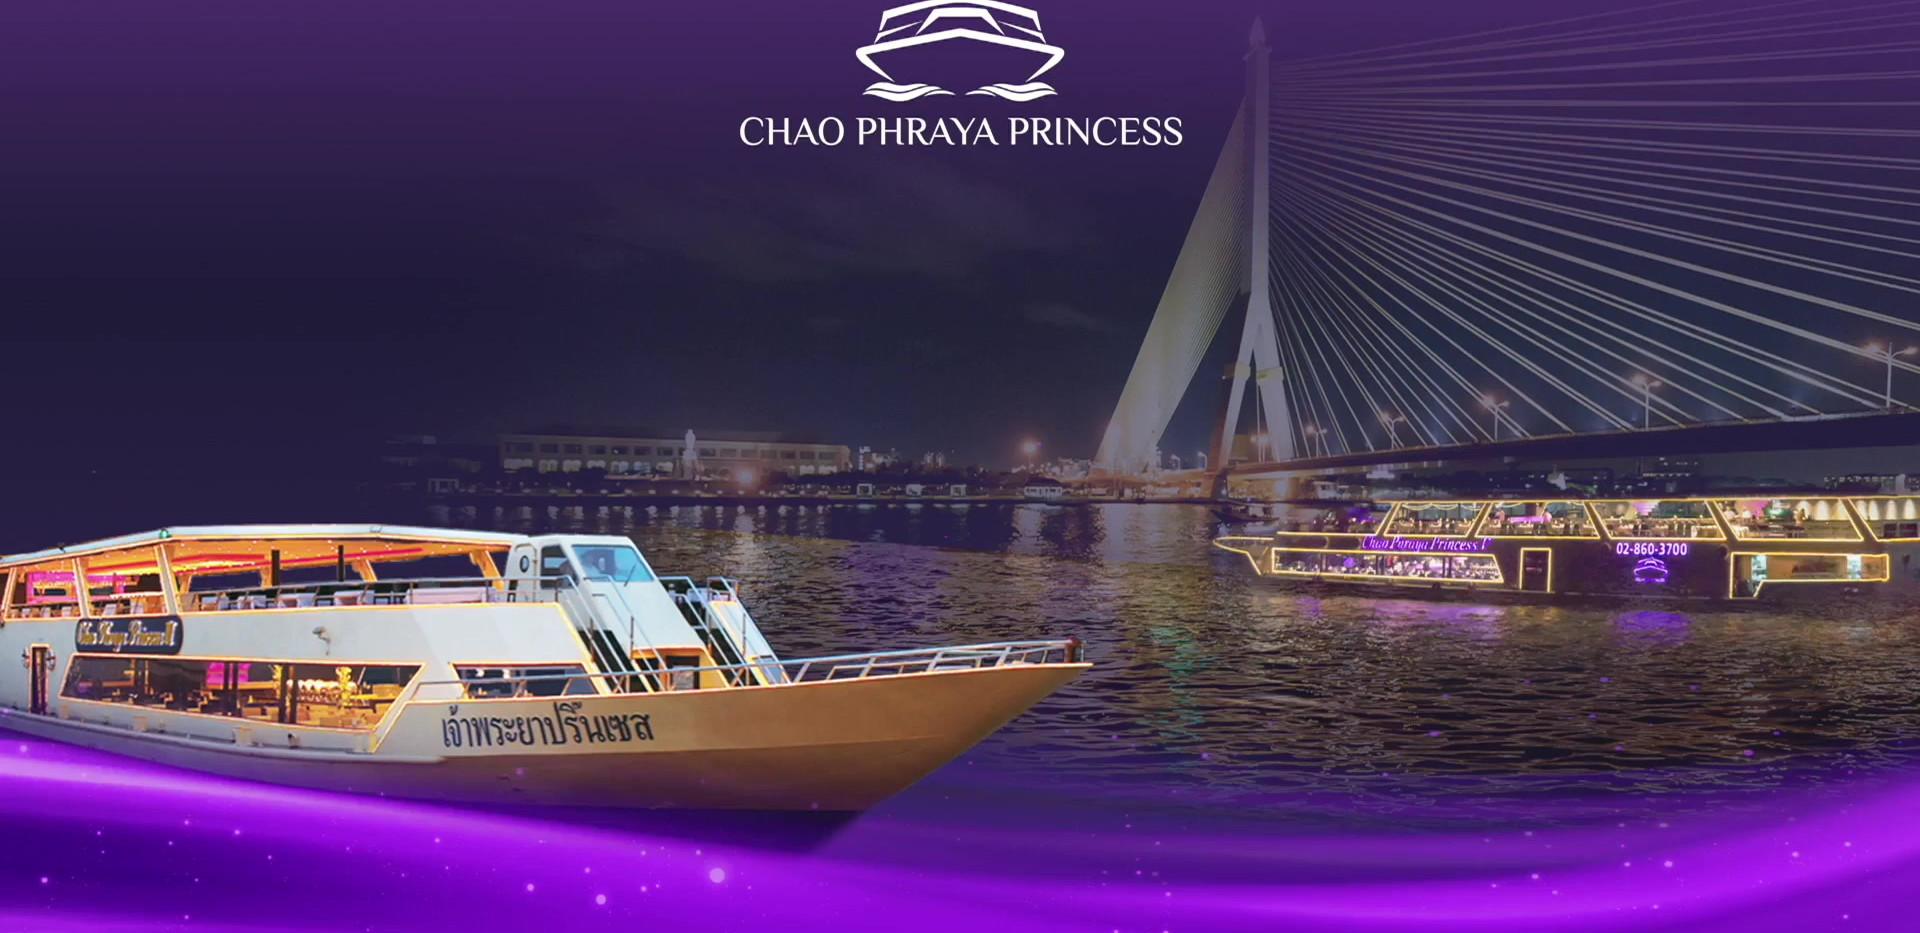 Chao Phraya Princess